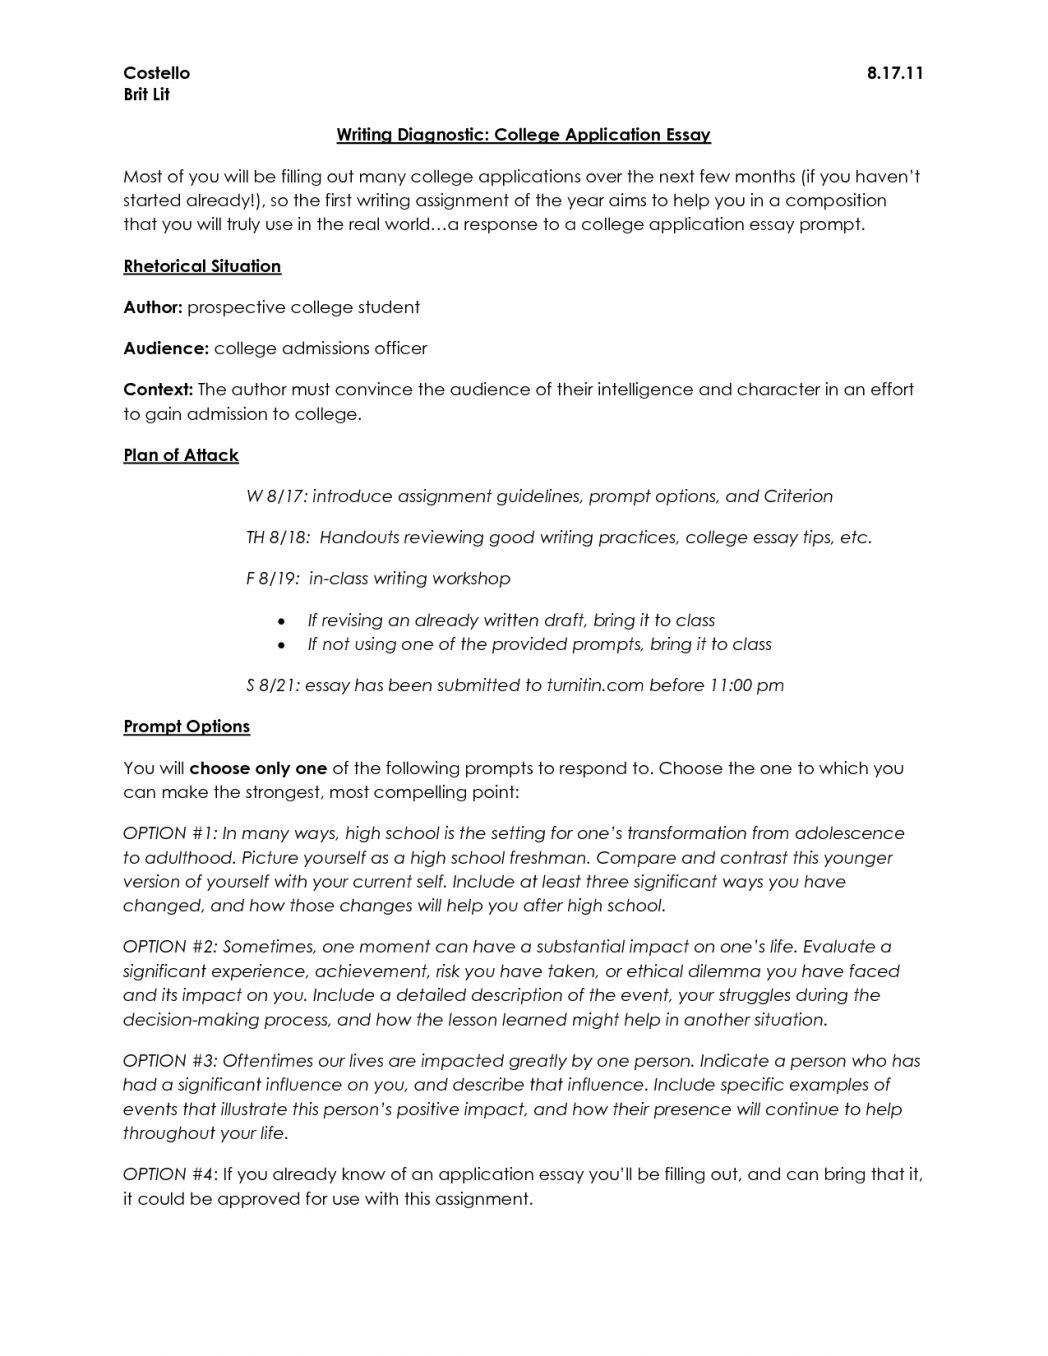 college essay prompt for uf